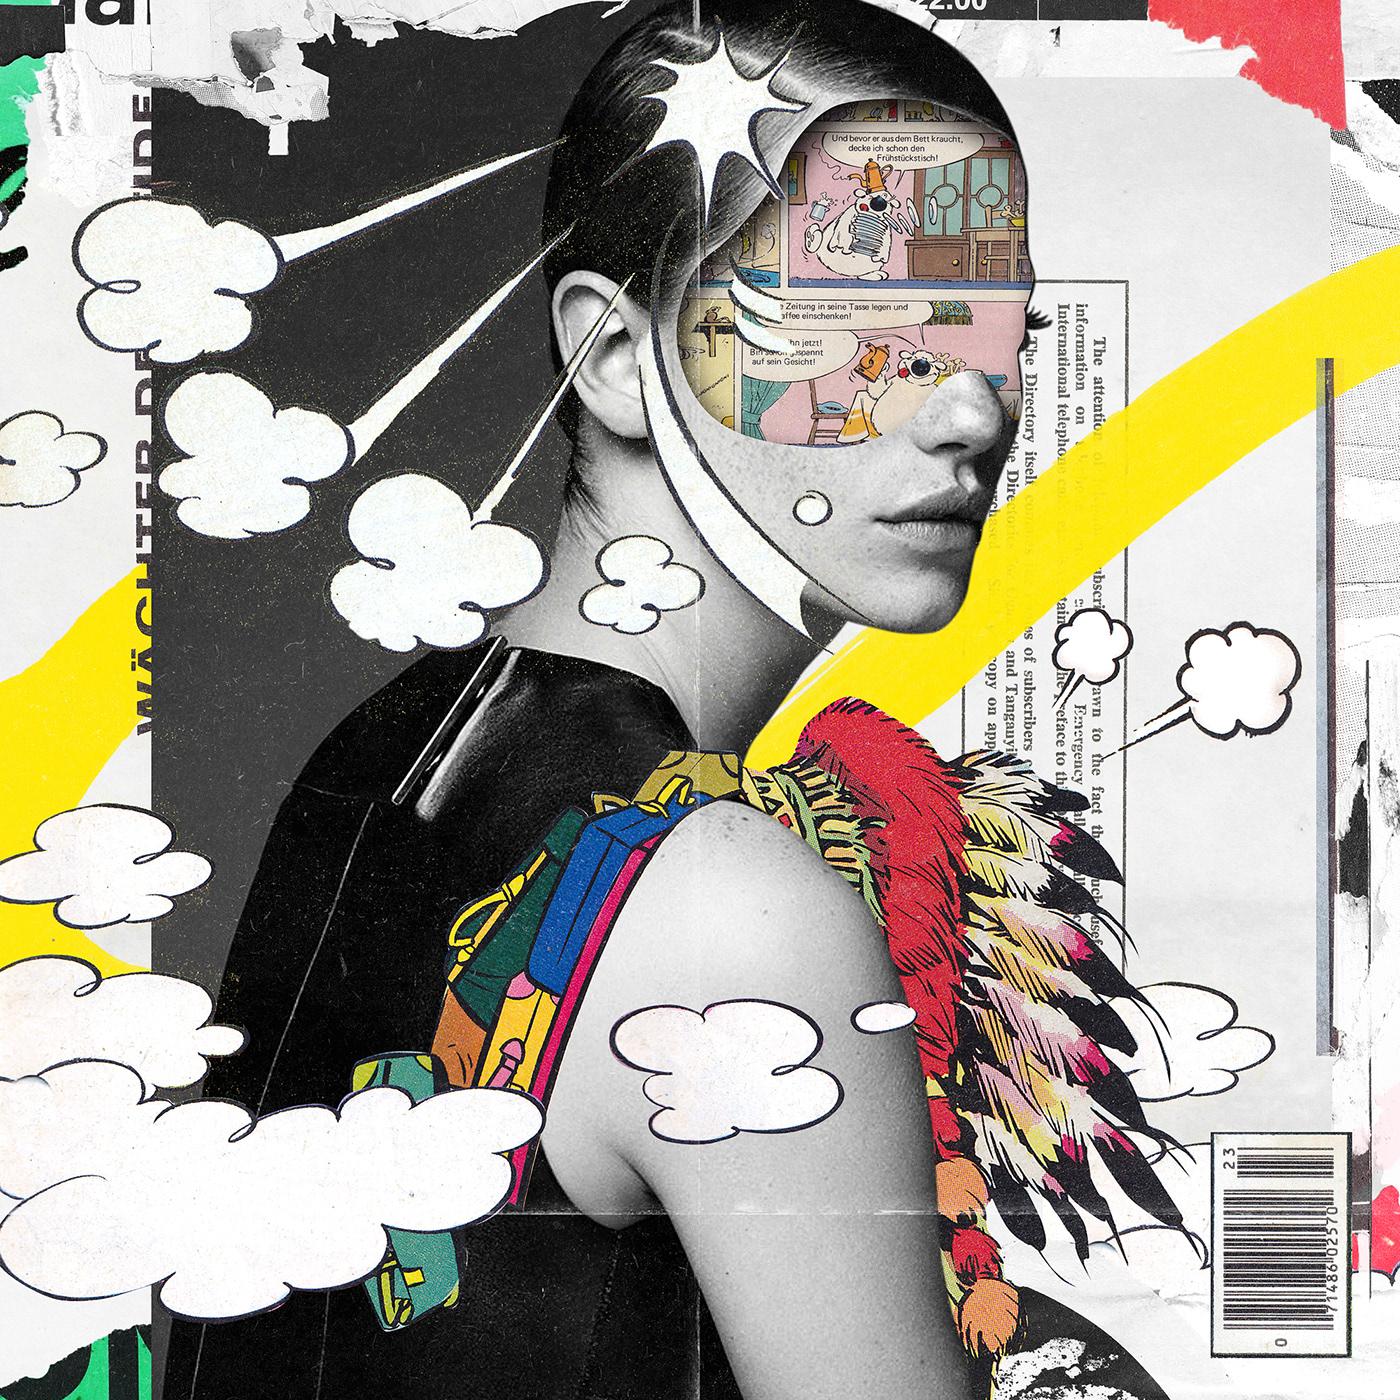 art direction  artwork collage cut and paste digital graphic graphic design  ILLUSTRATION  イラスト コラージュ